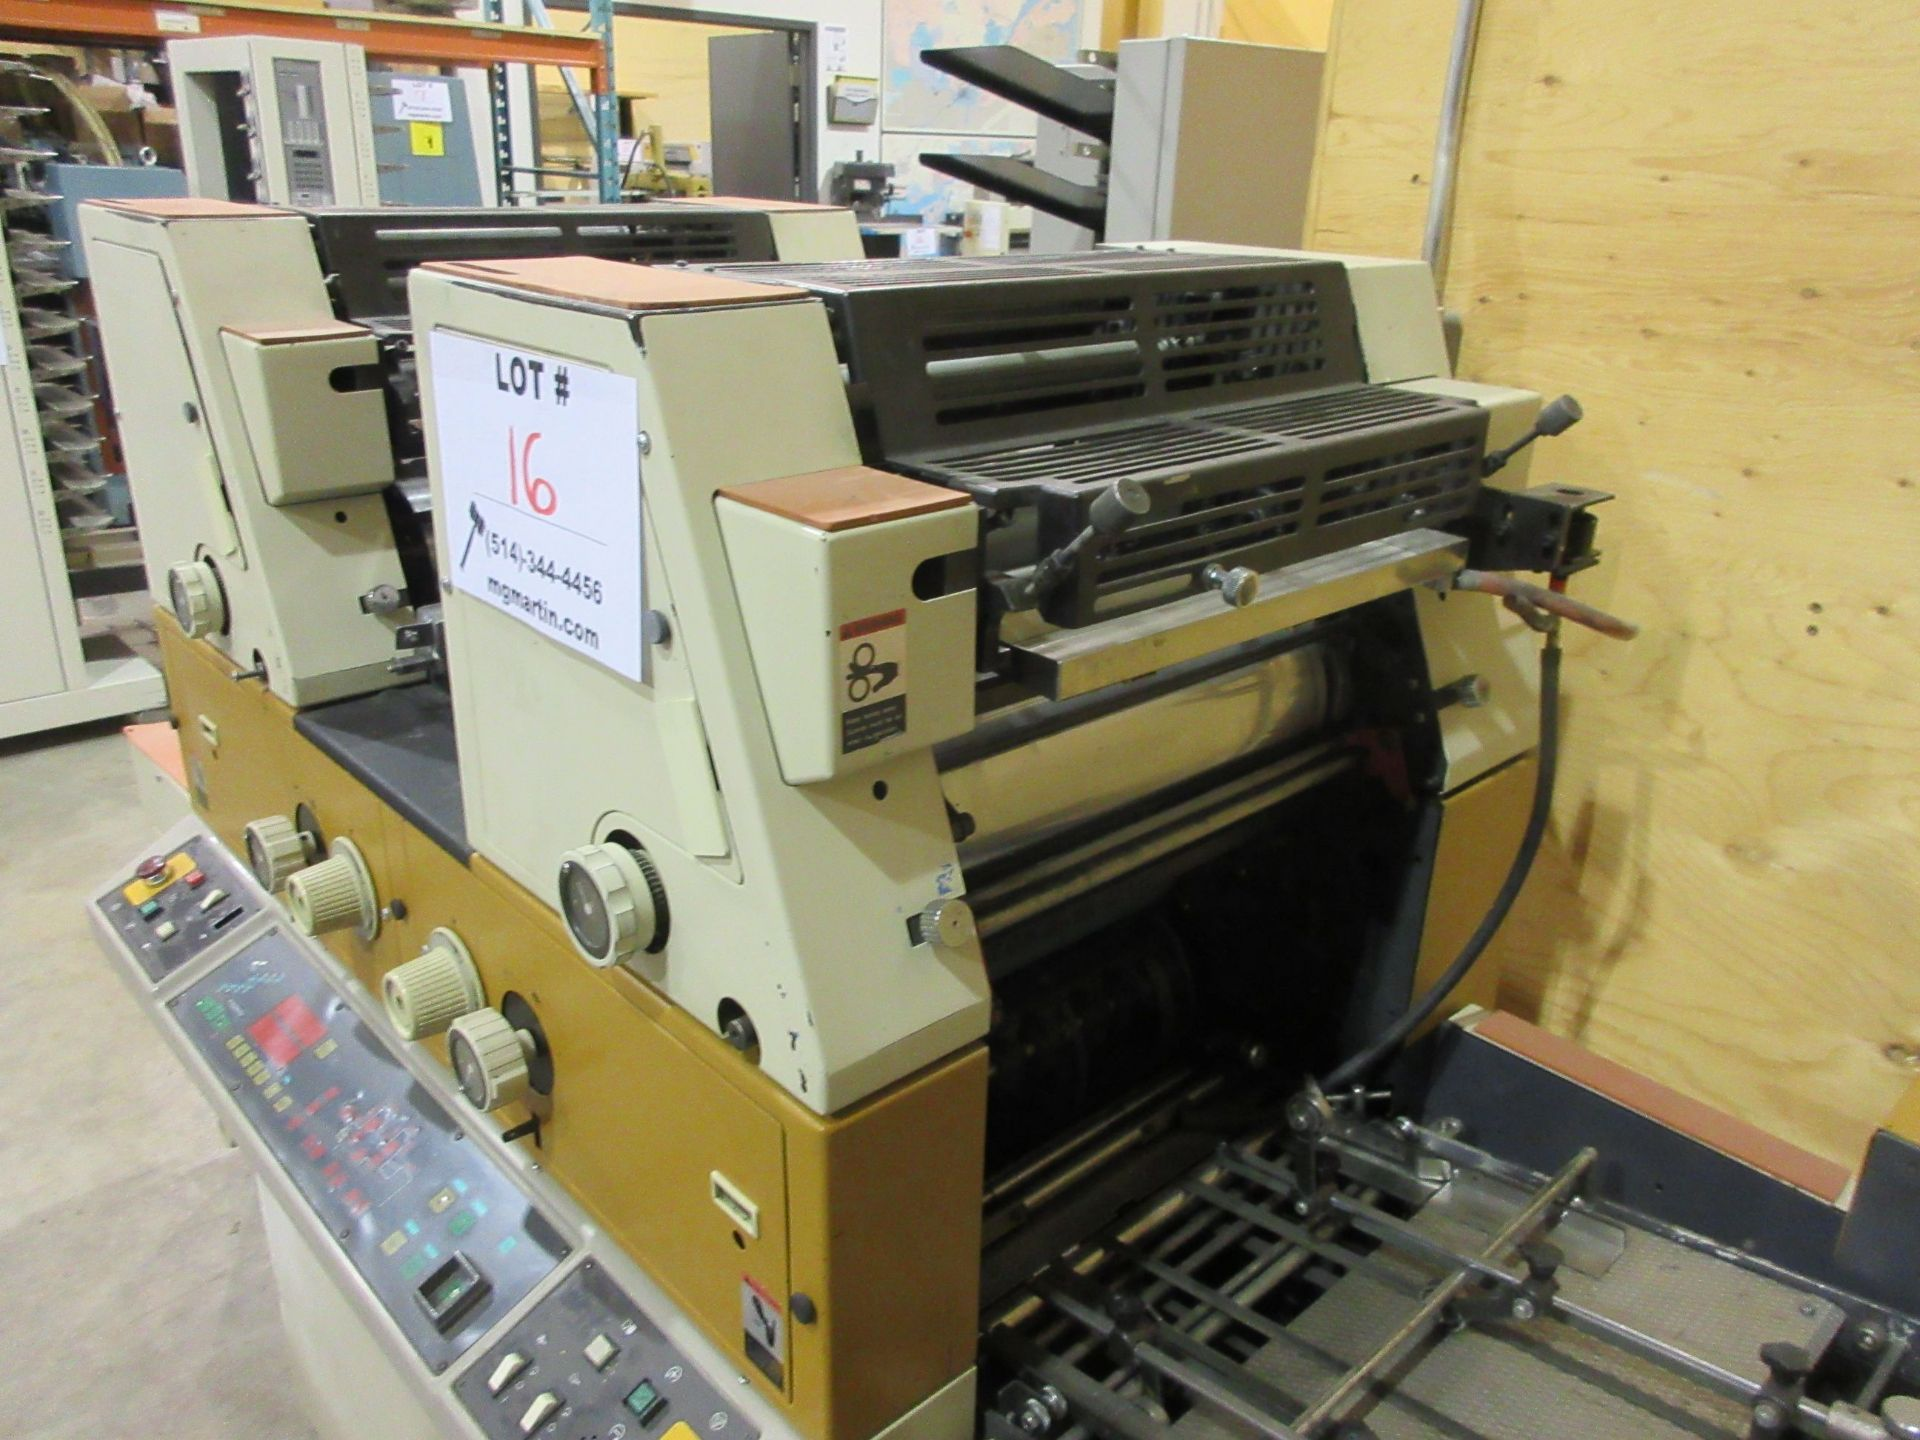 RYOBI ITEK 3985 TRUE (2) color offset press c/w ROYCE chiller - Image 5 of 8